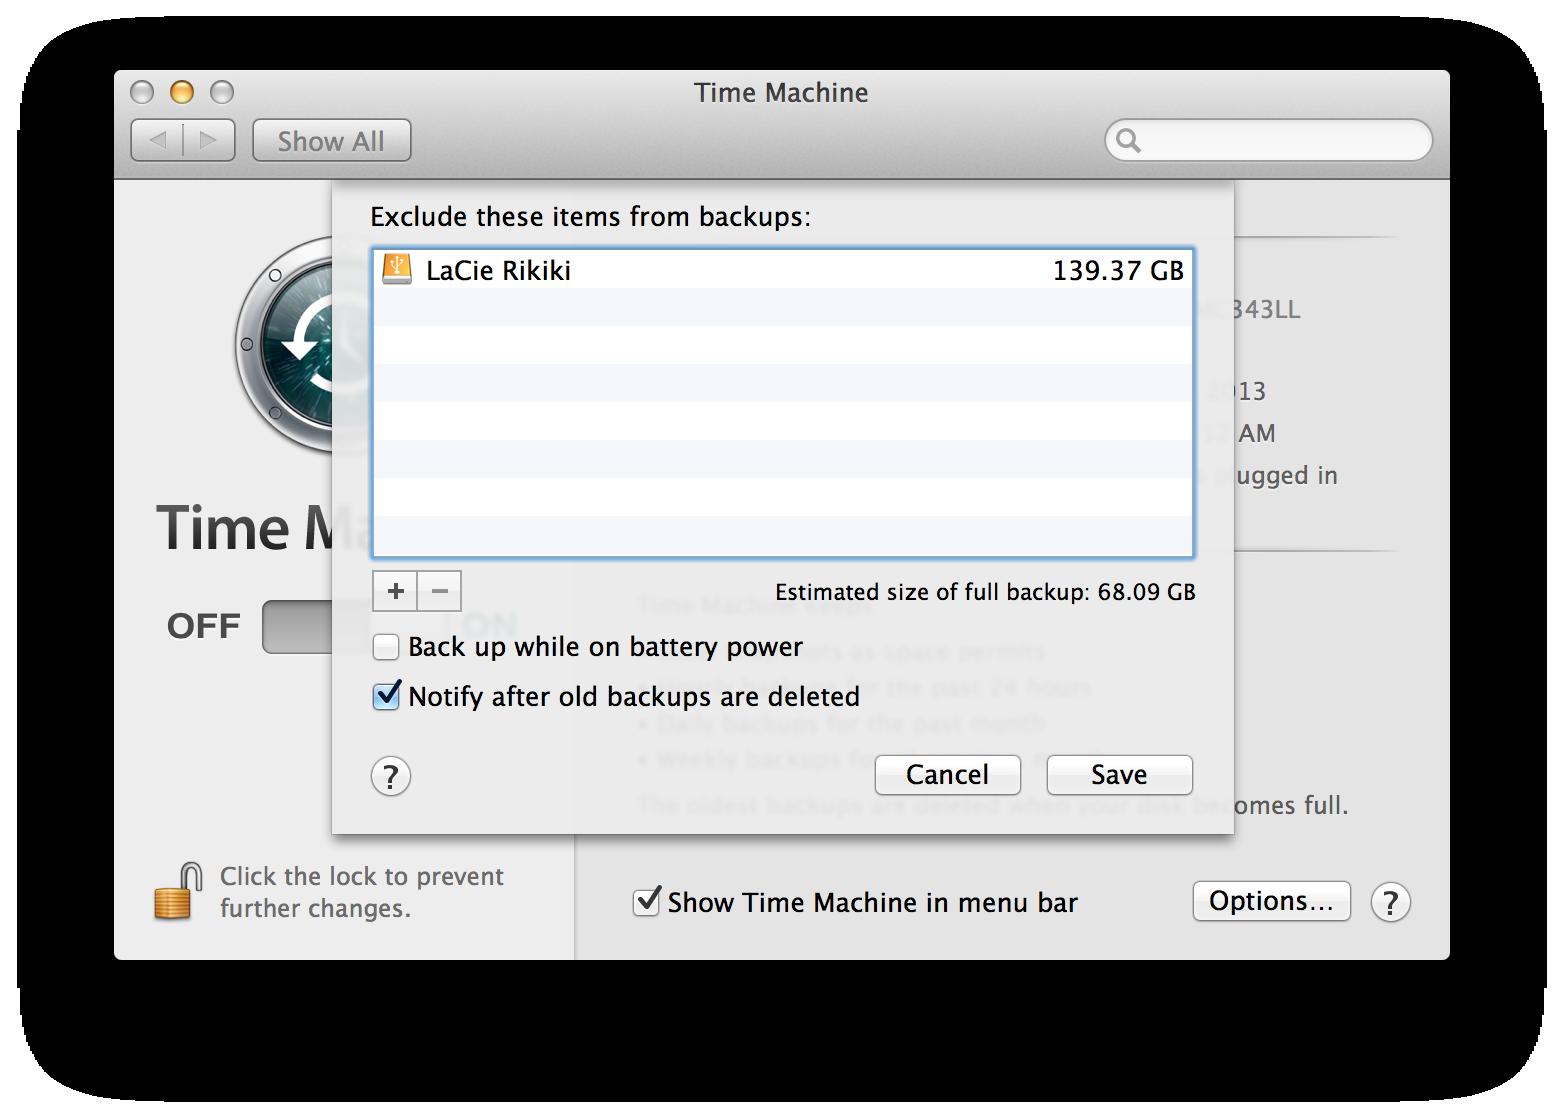 Stop Time Machine